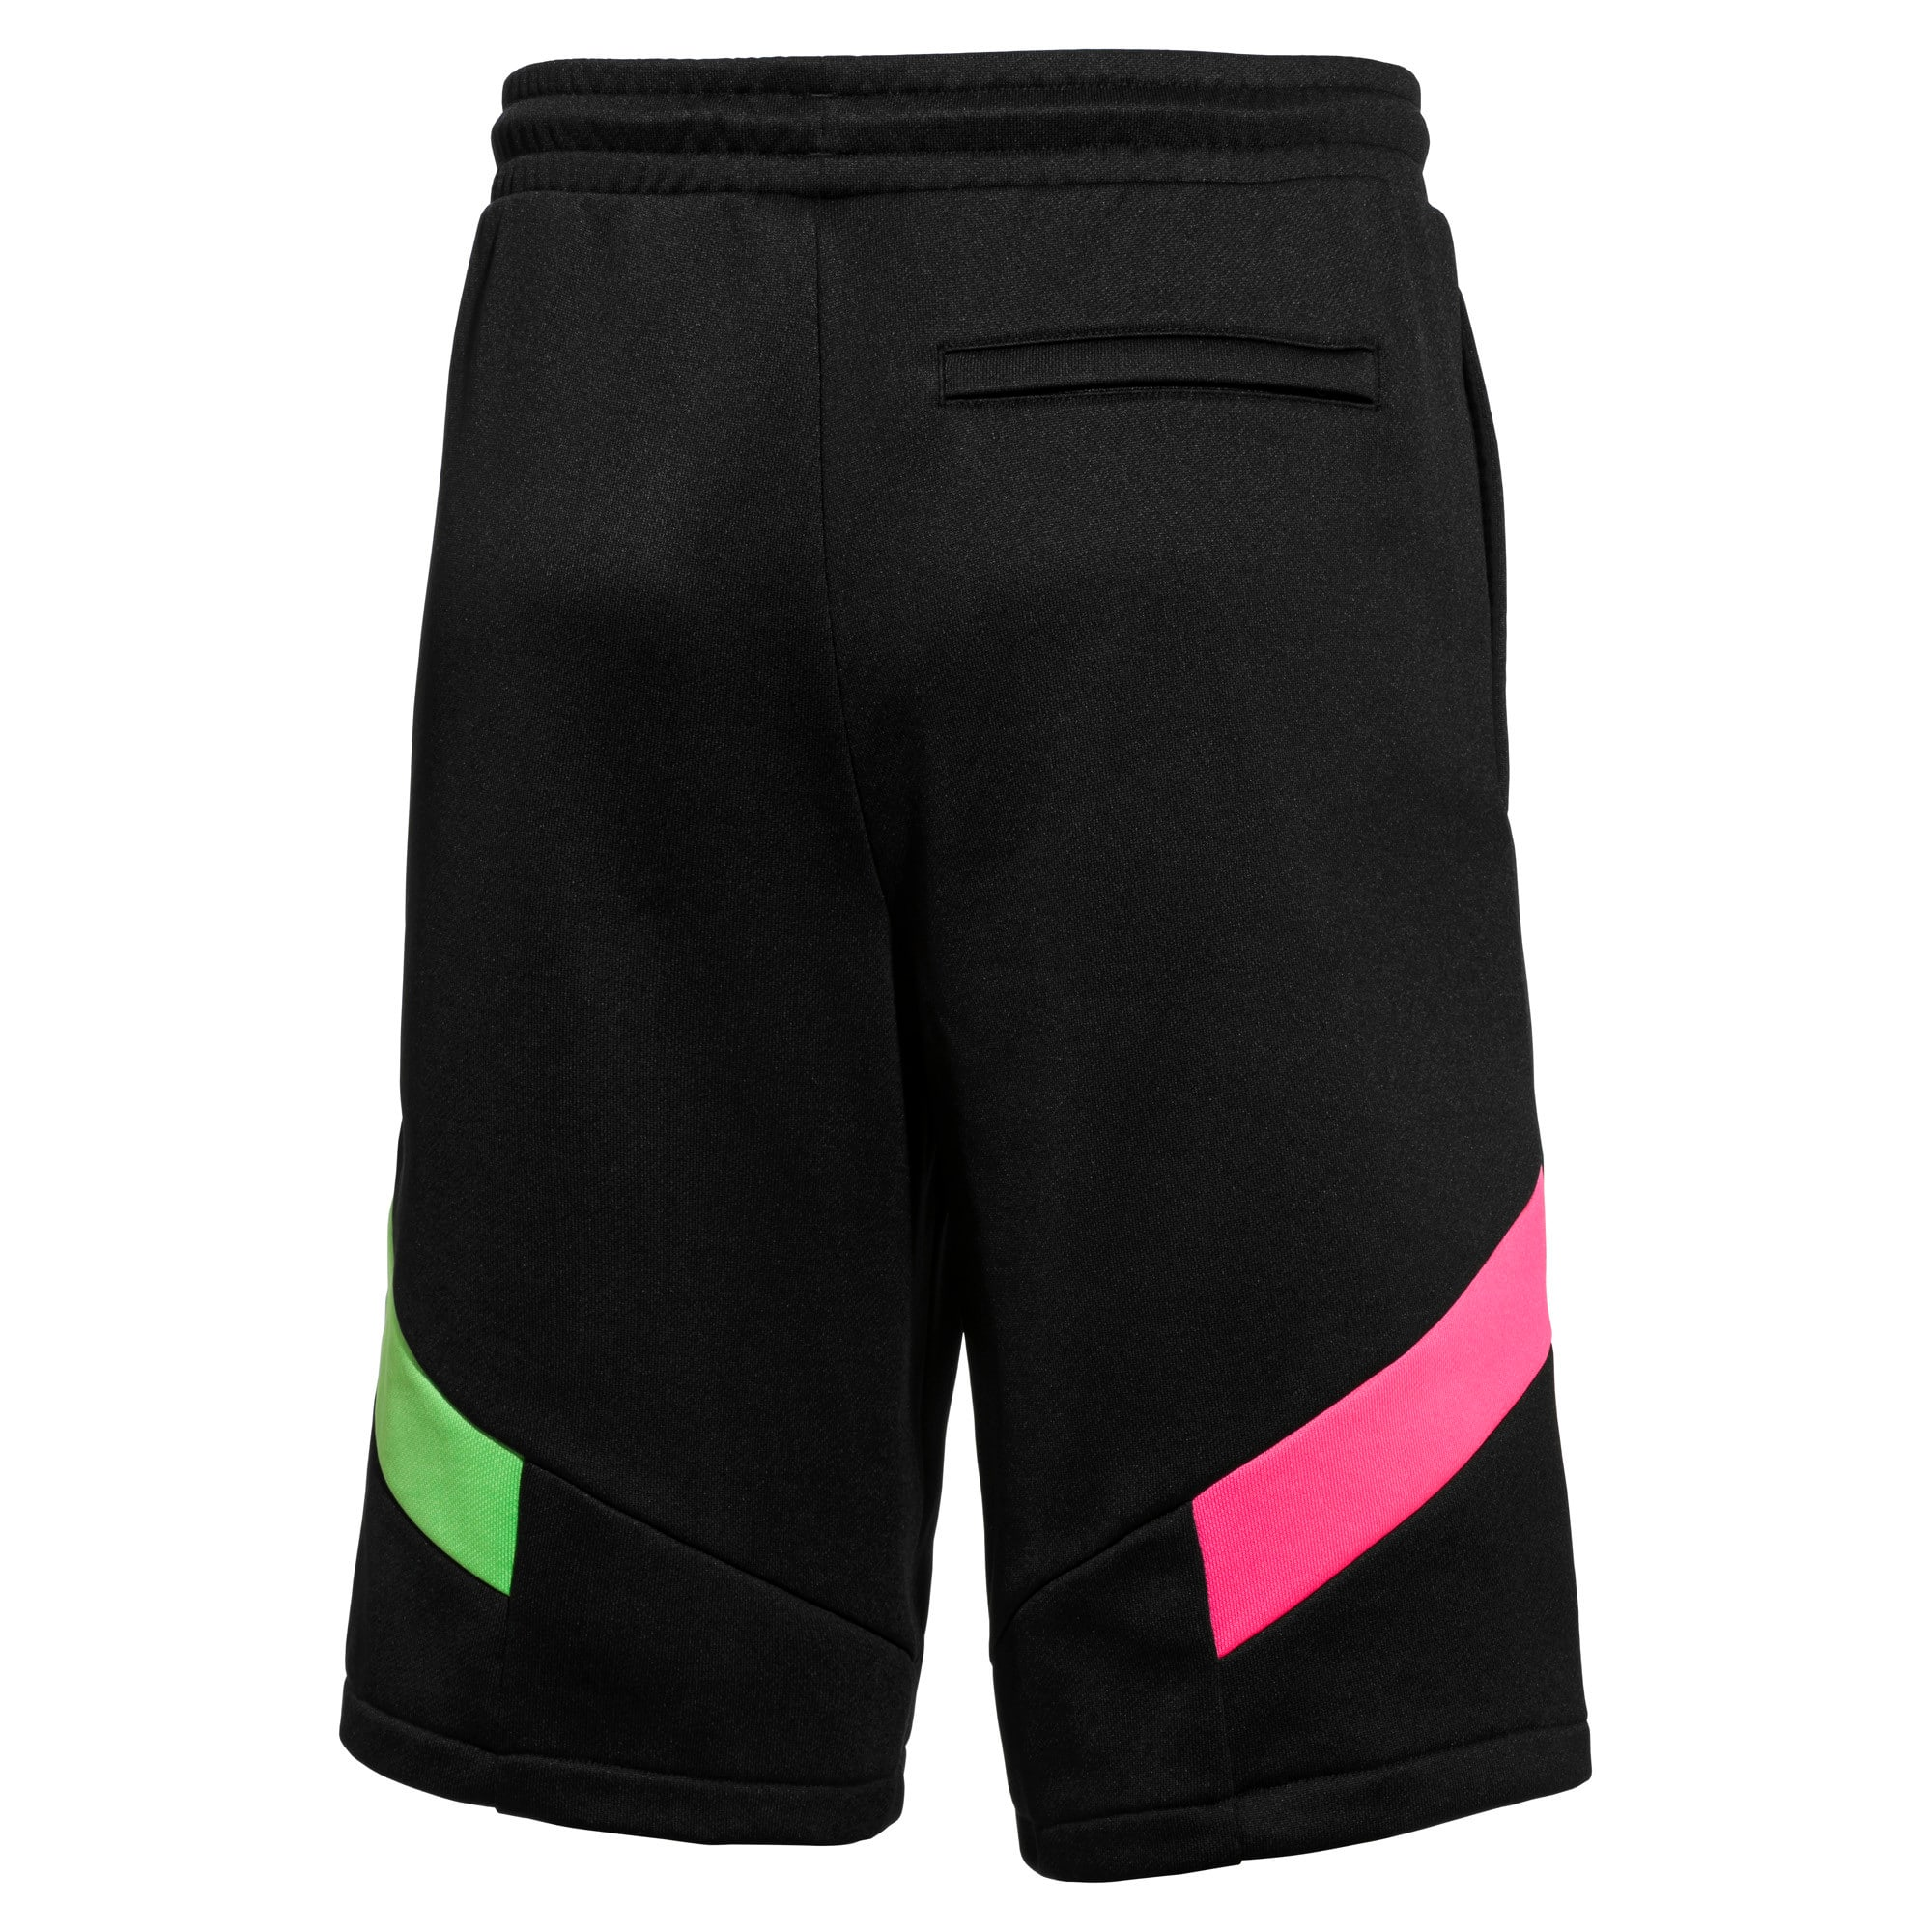 Thumbnail 2 of PUMA x MTV MCS Men's Shorts, Puma Black, medium